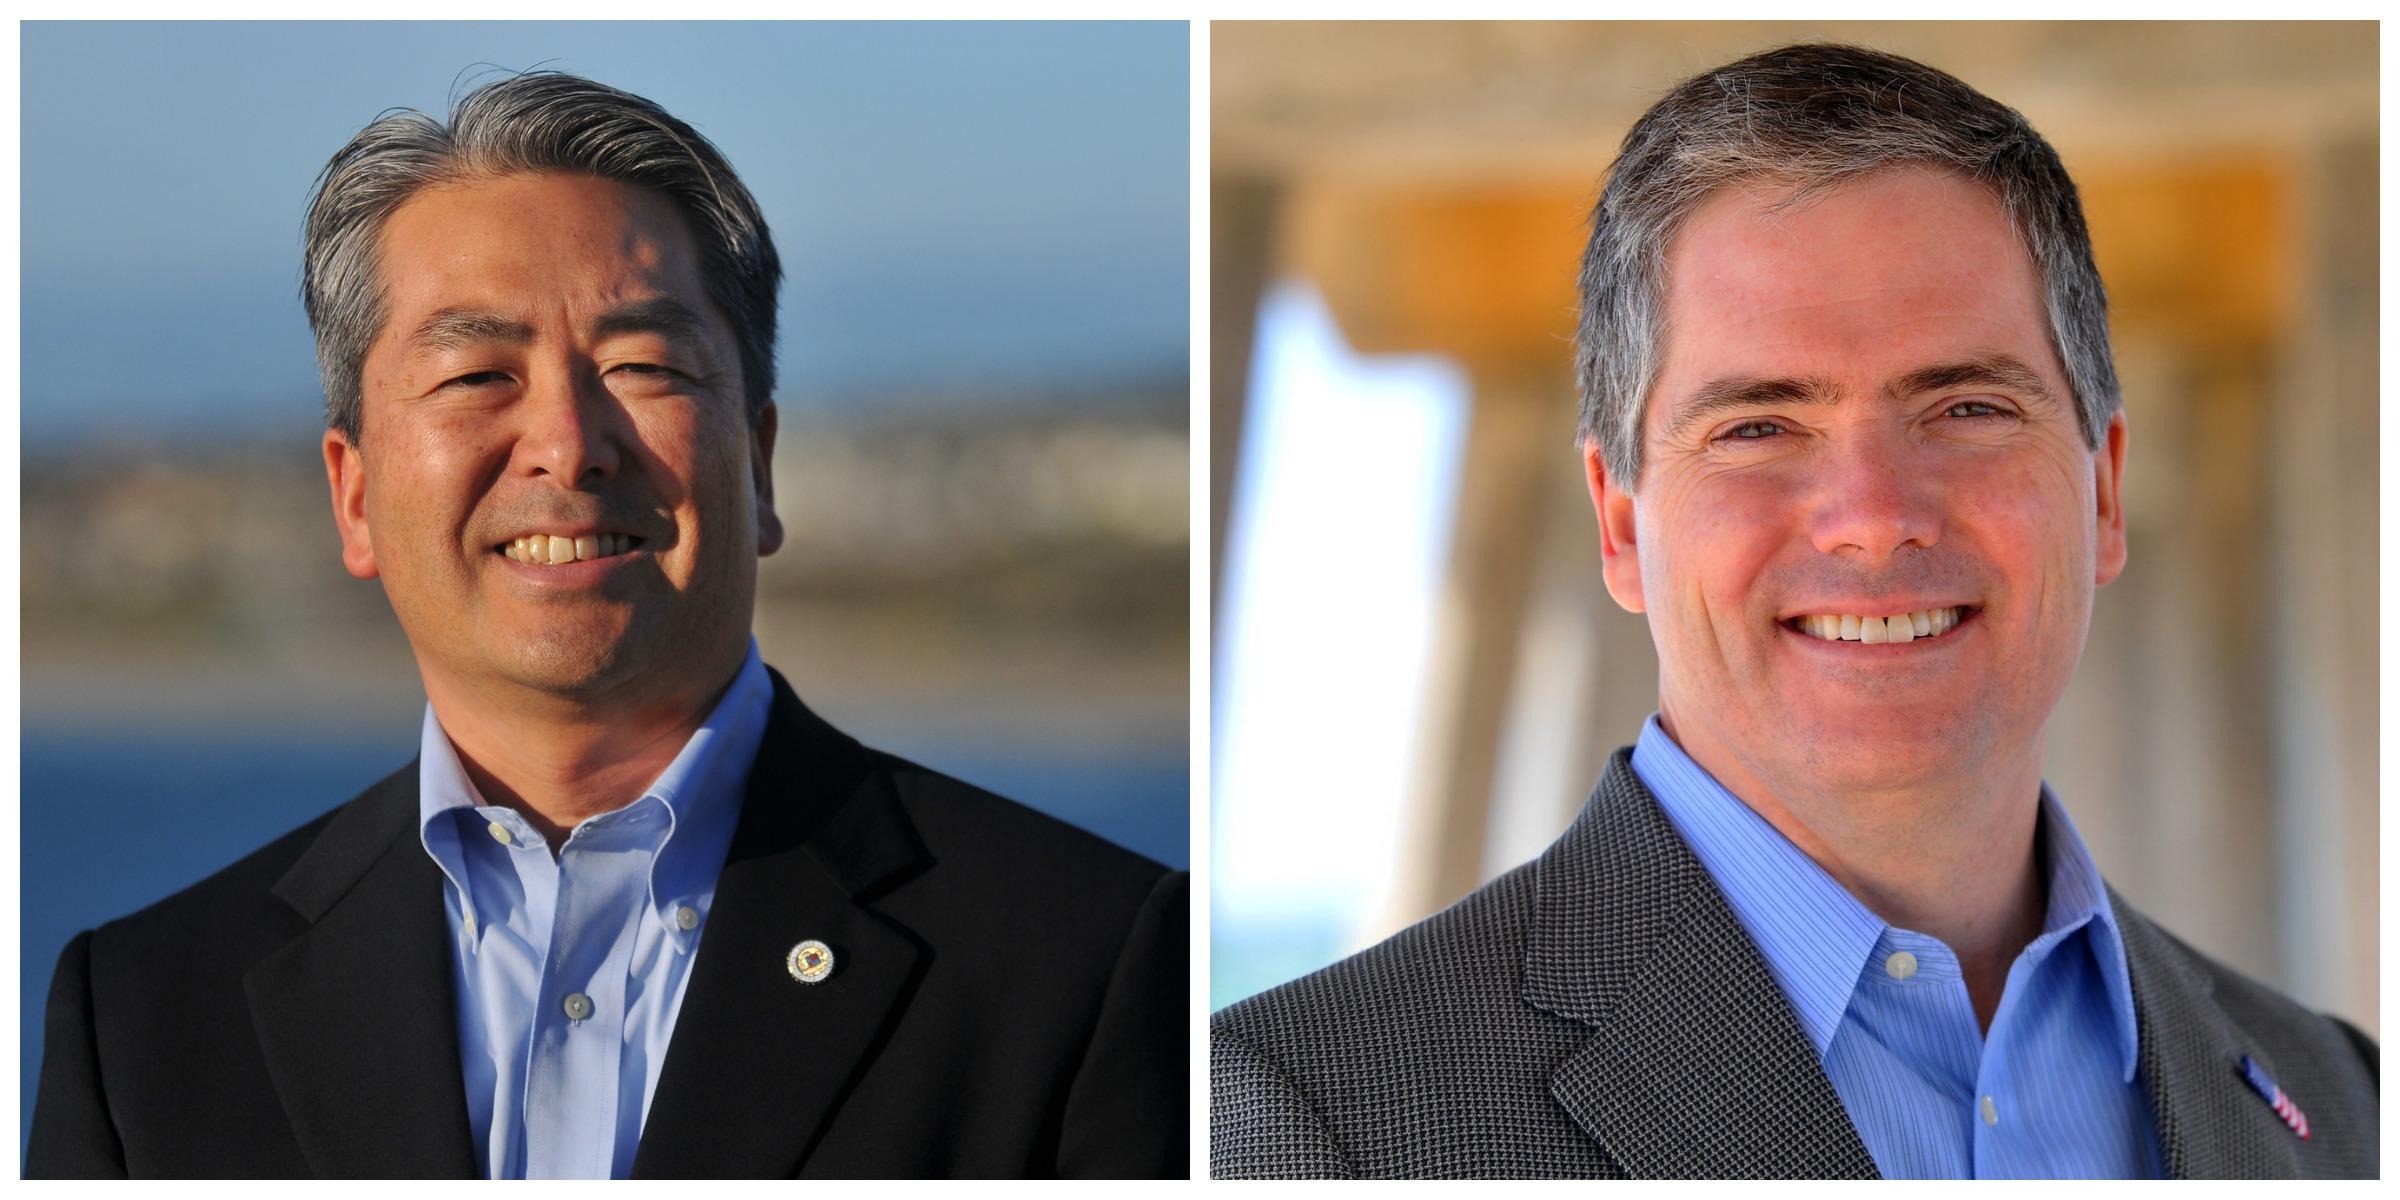 Incumbent Assemblymember Al Muratsuchi (left) will defend his seat against Republican challenger David Hadley this November.